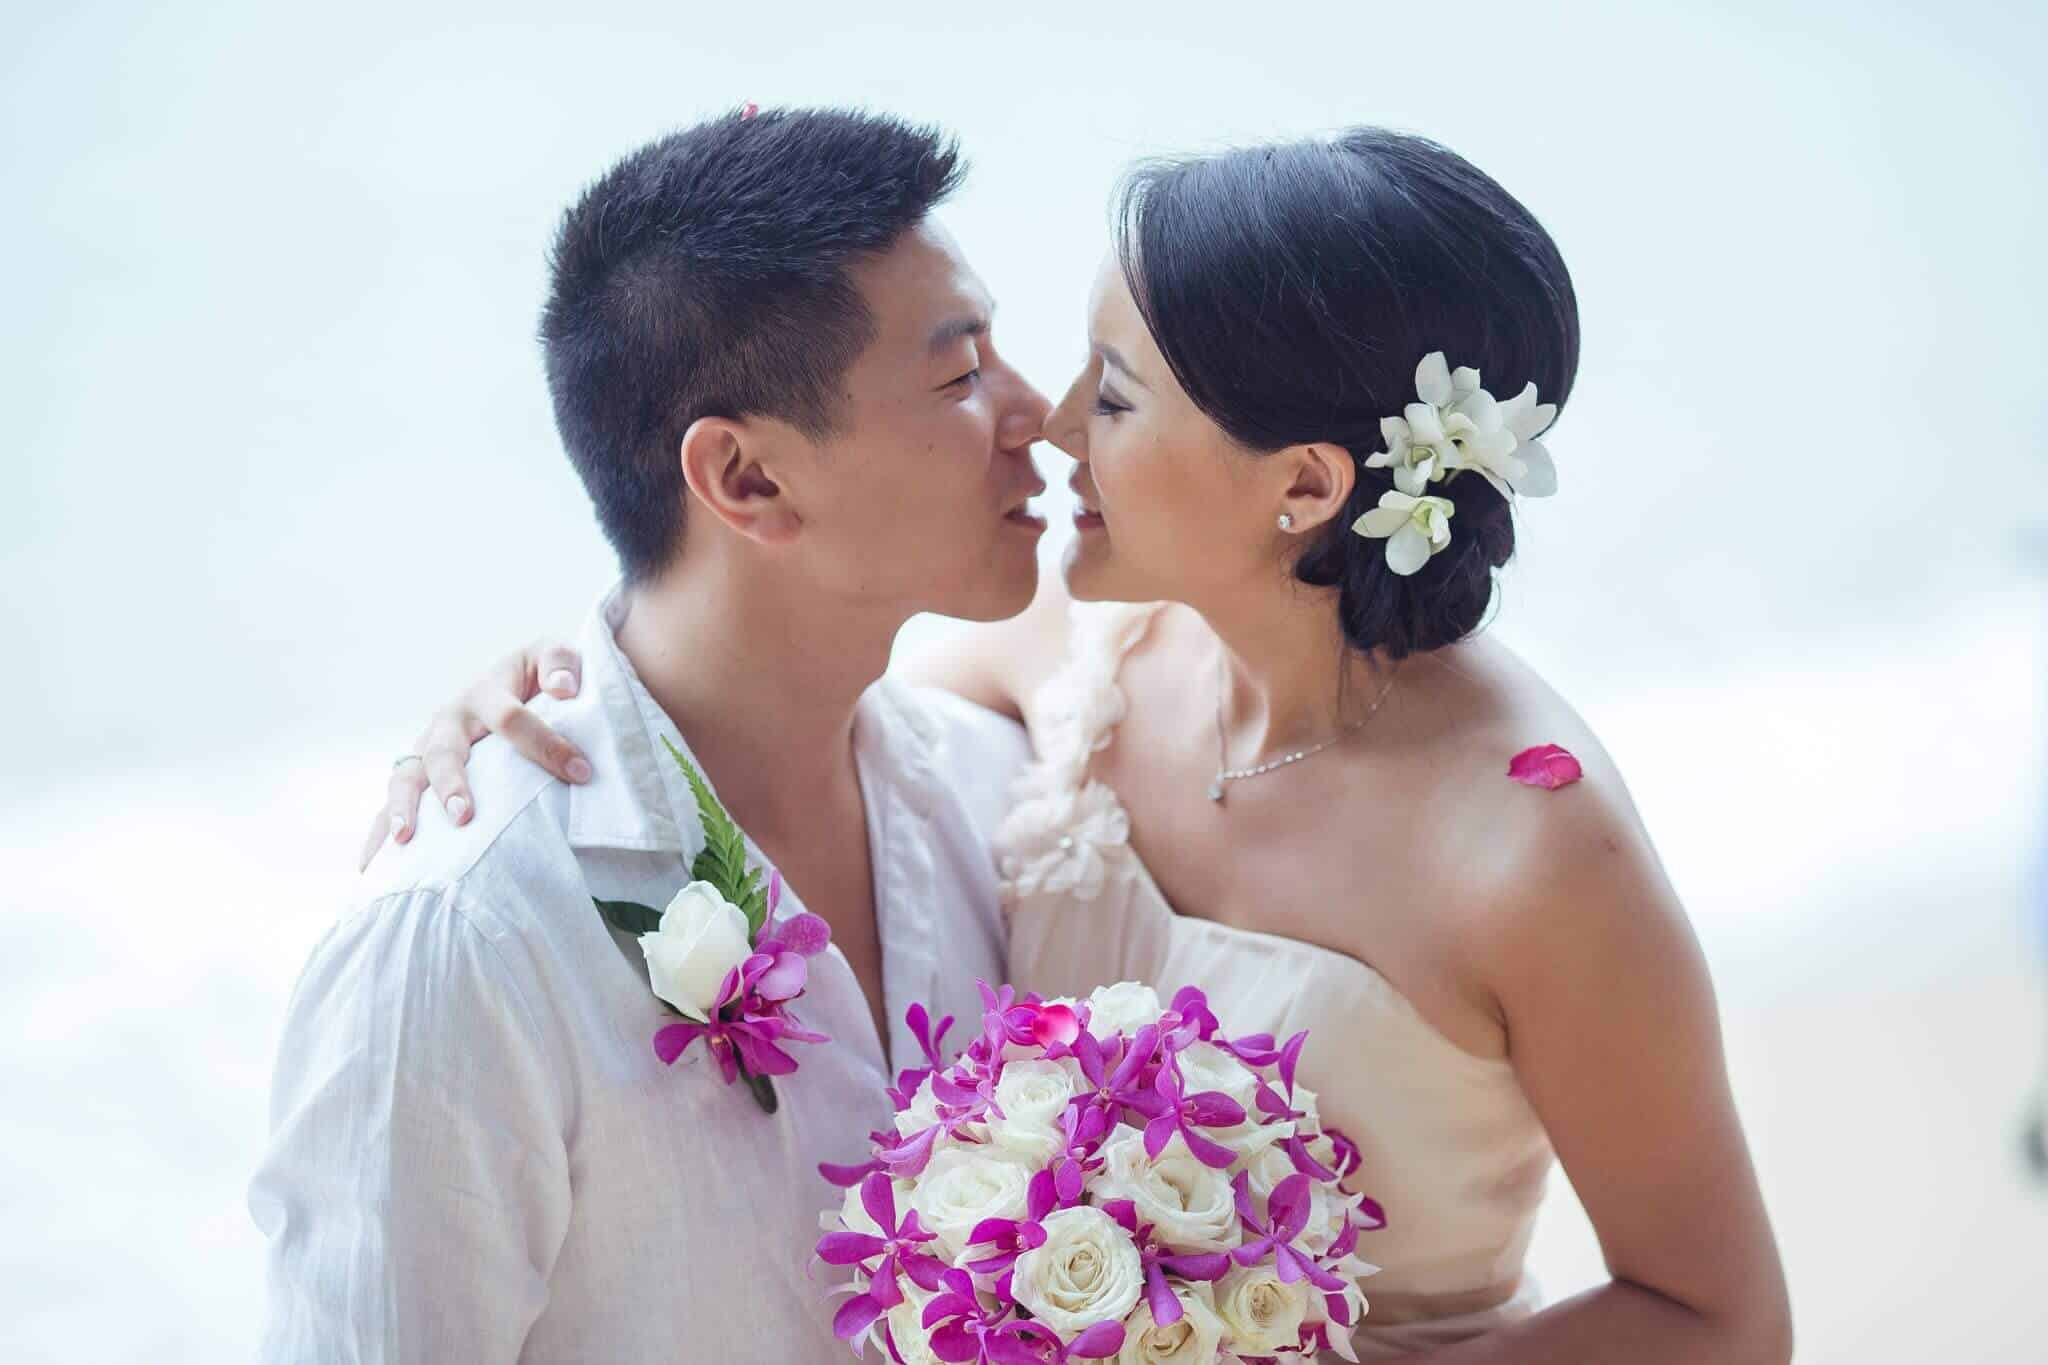 Phuket Beach Wedding - Kiss Bride and Groom